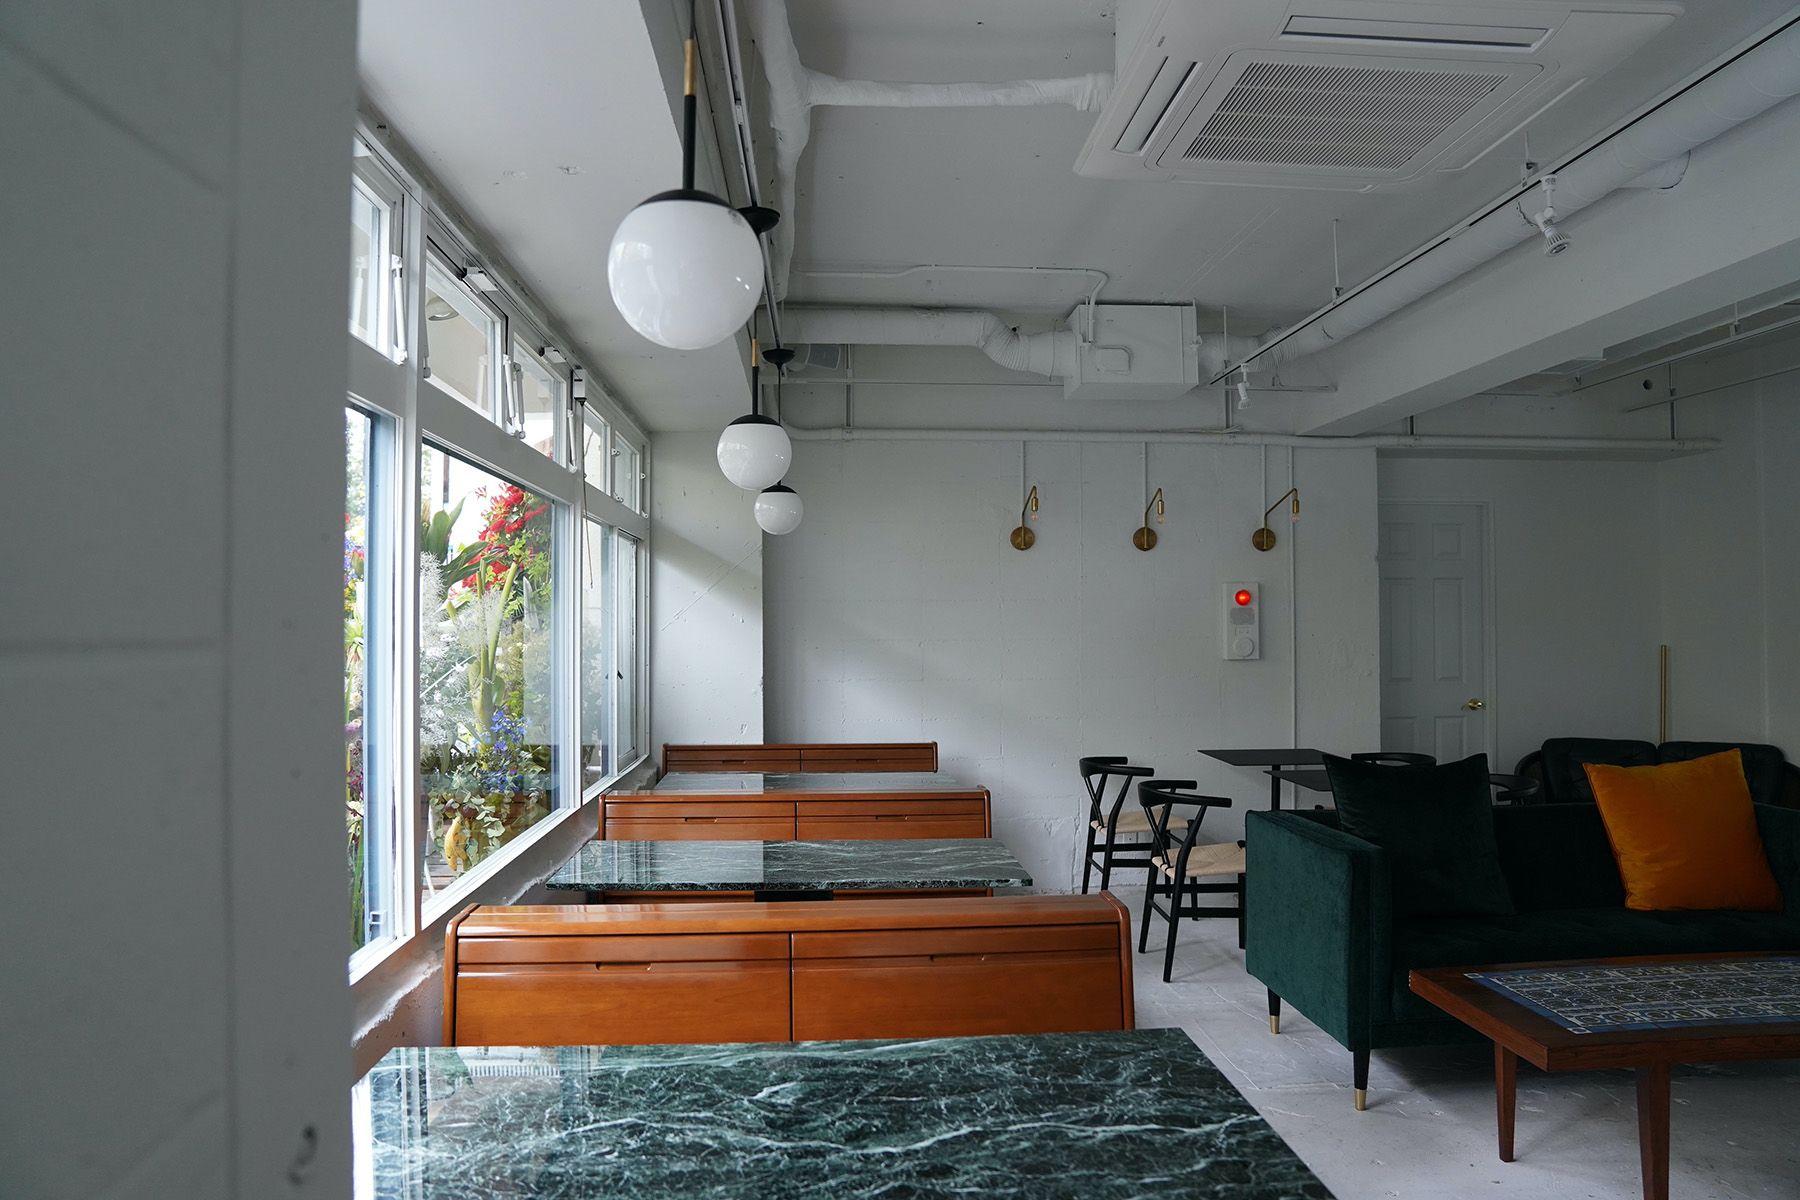 ANEA CAFÉ  松見坂/店舗 (アネアカフェ マツミザカ)テーブルは大理石の天板